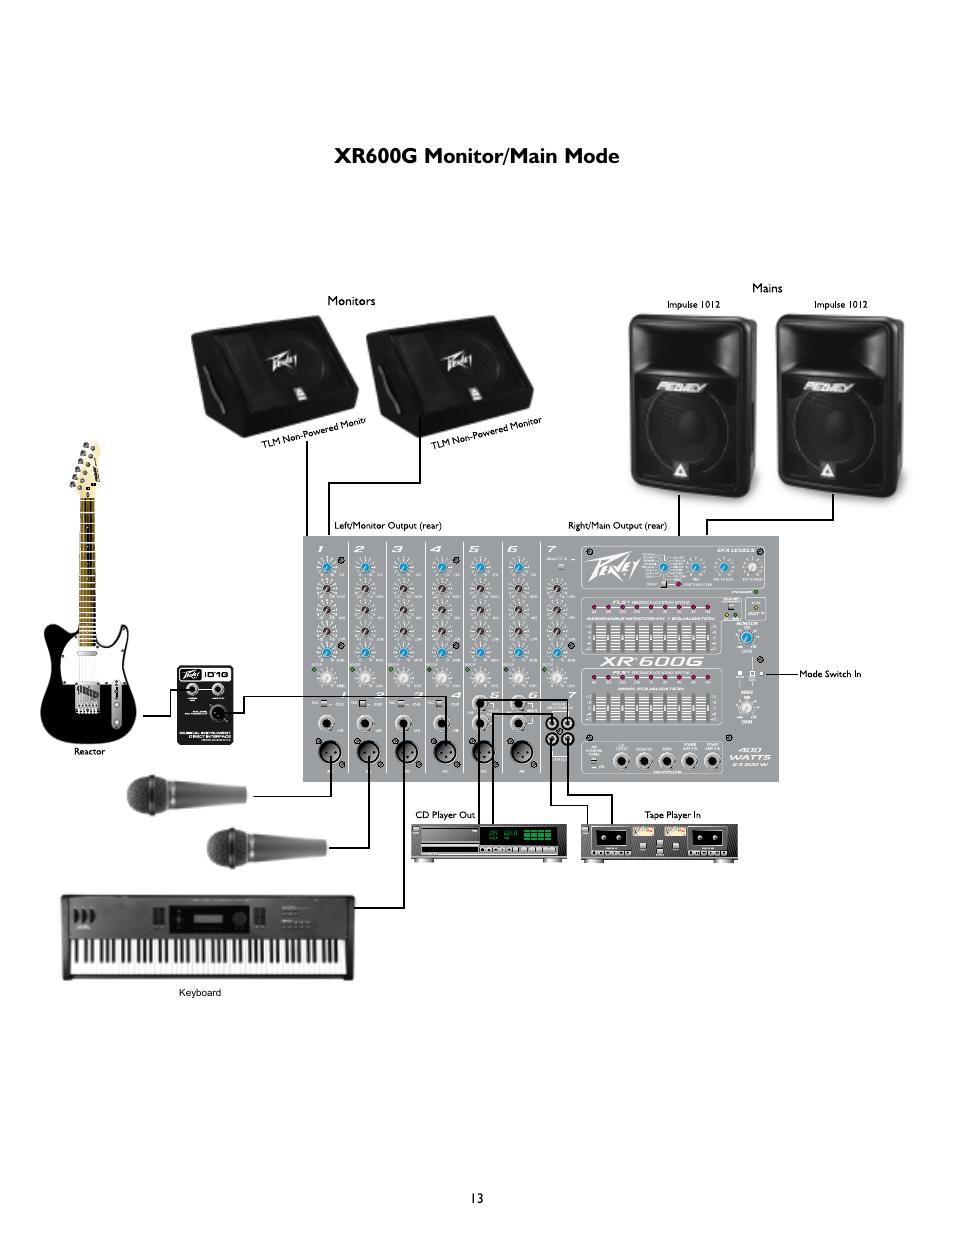 xr600g monitor main mode peavey xr 600g user manual page 13 44 rh manualsdir com